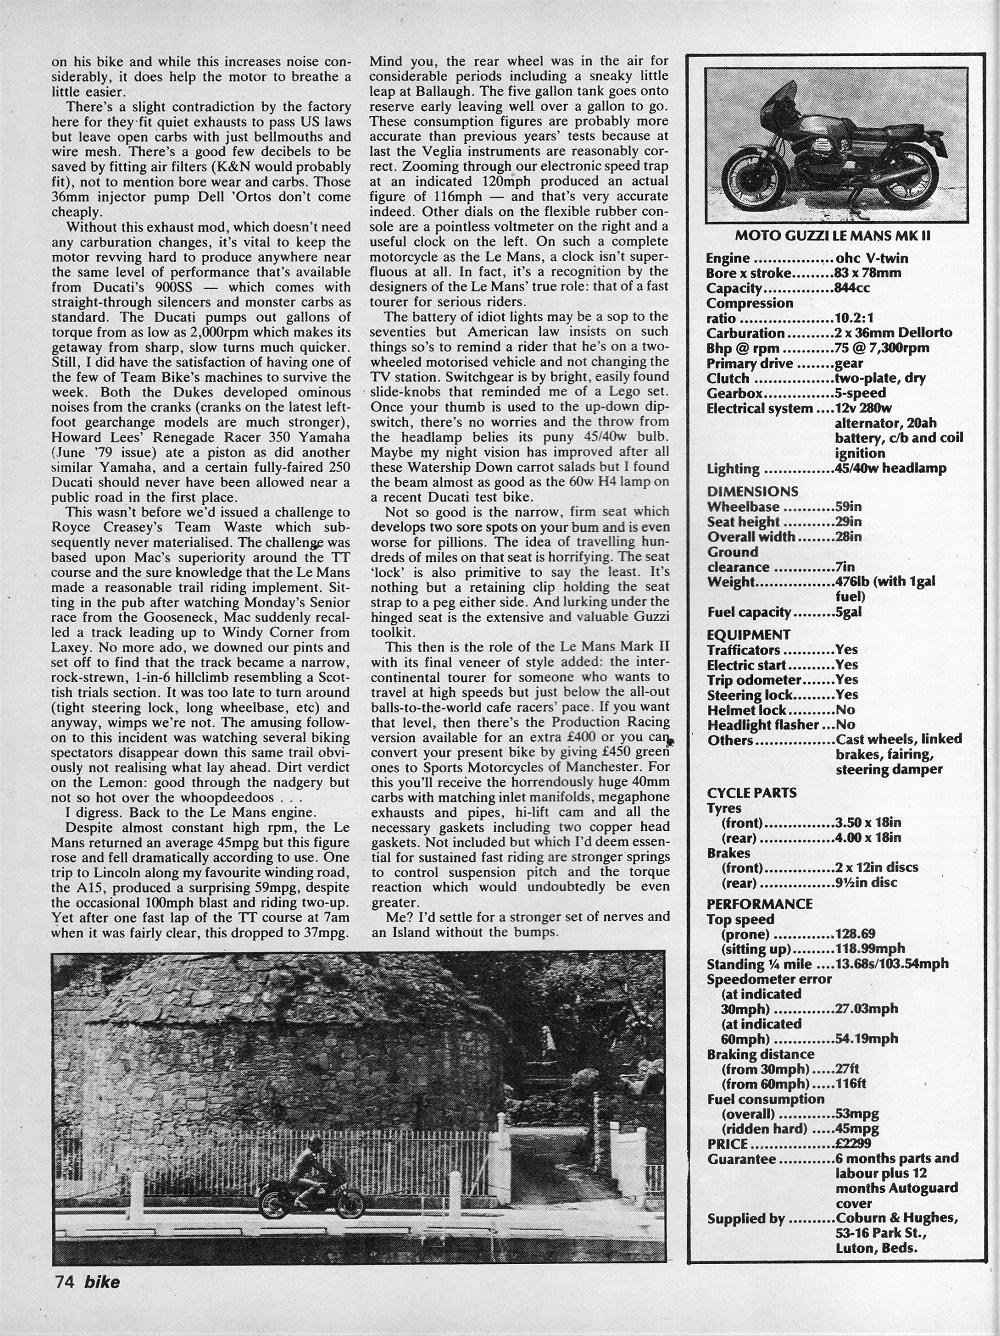 1979 Moto Guzzi Le Mans MK II road test.5.jpg